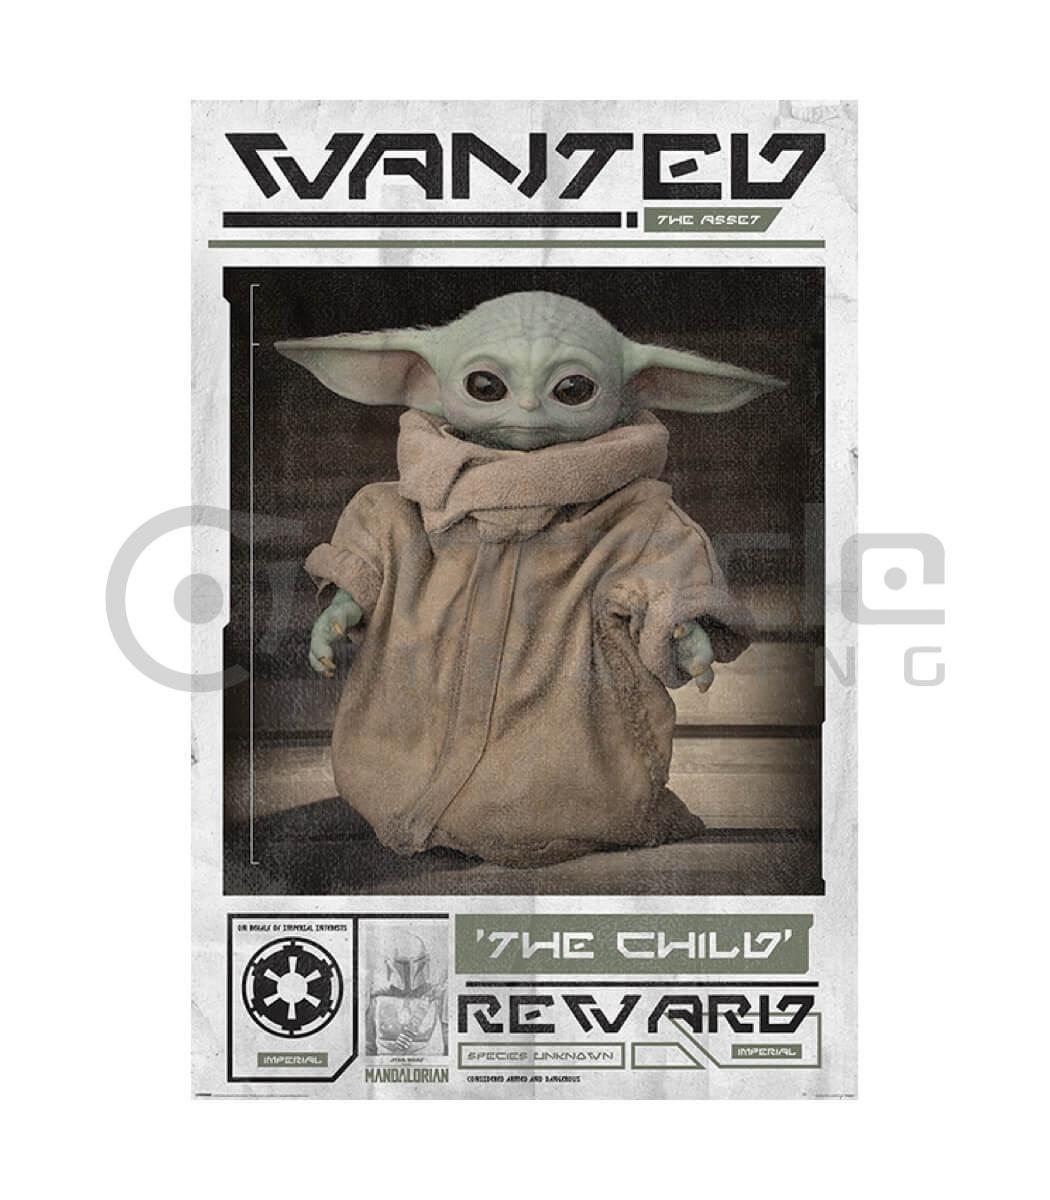 Star Wars: The Mandalorian Poster - Wanted